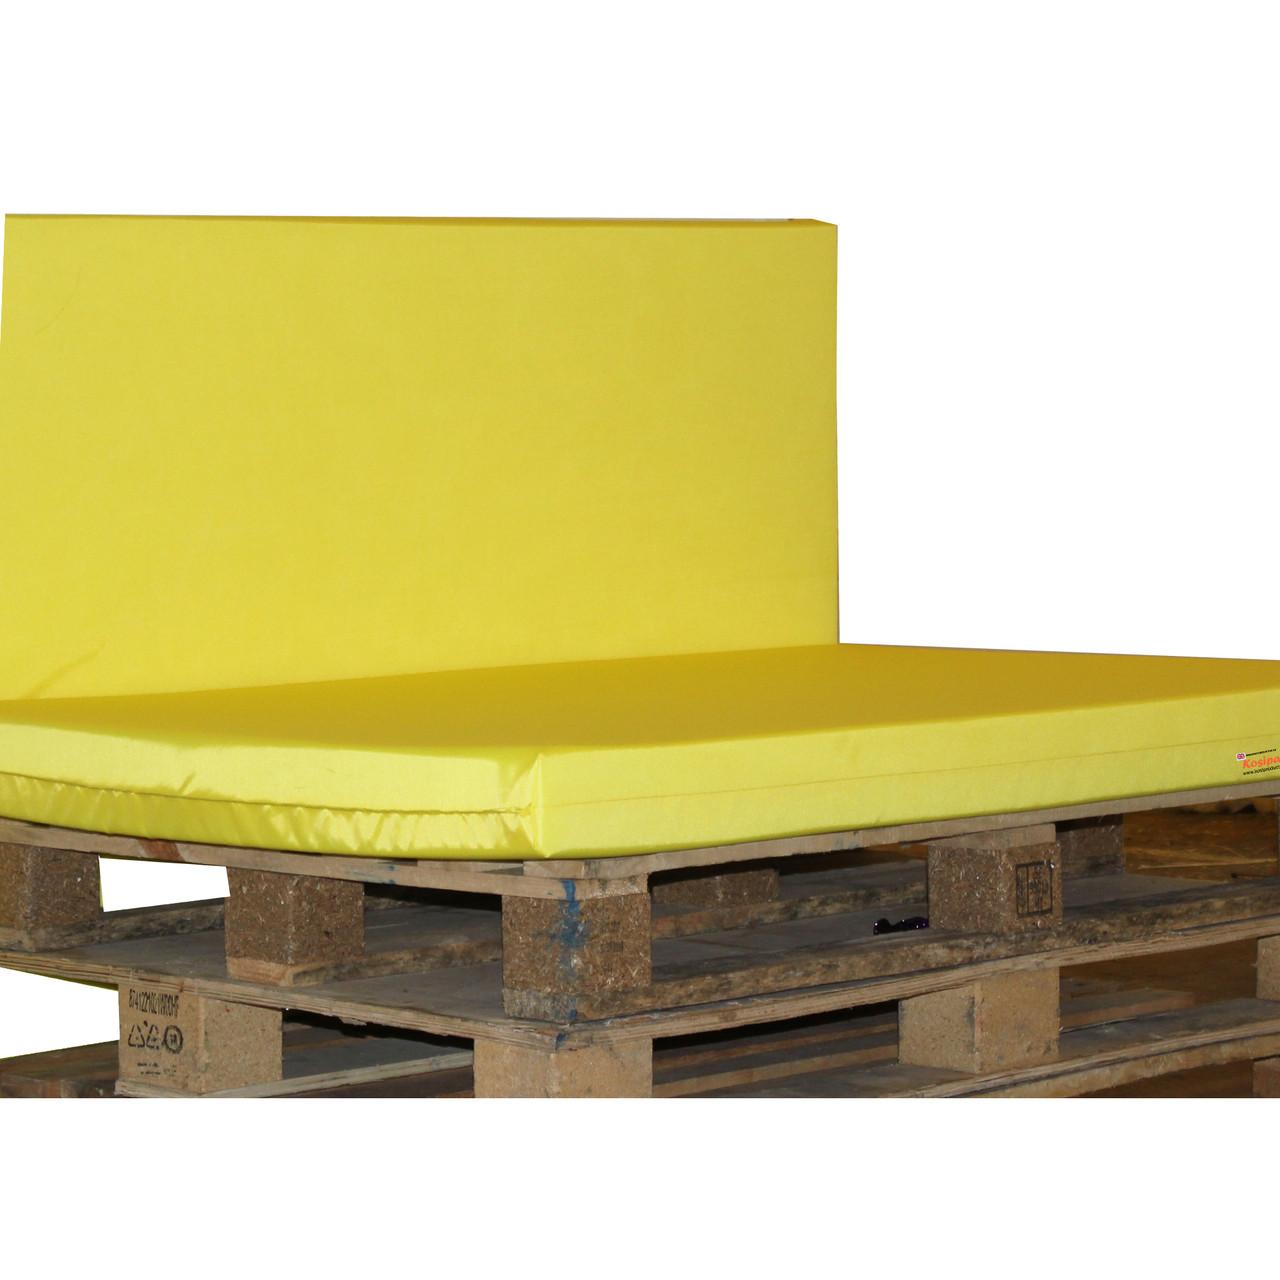 Kosipad Yellow waterproof pallet  Cushions for Euro Pallets